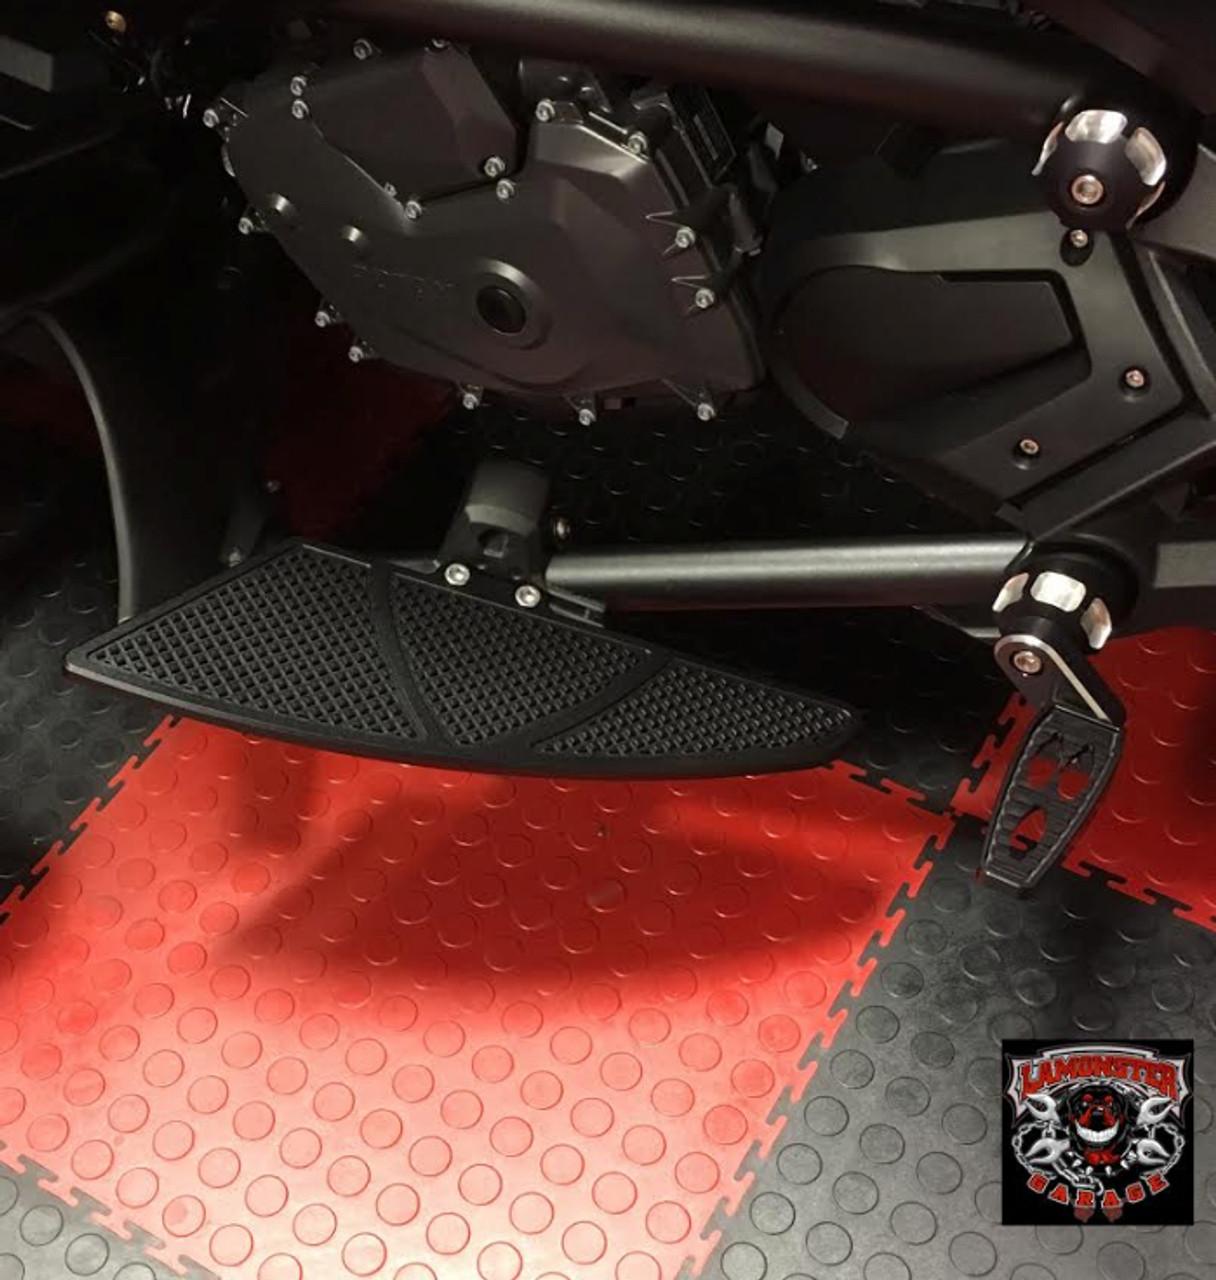 F3 Black Dymond Gripper Floorboards (OEM Floorboard Mount Only)